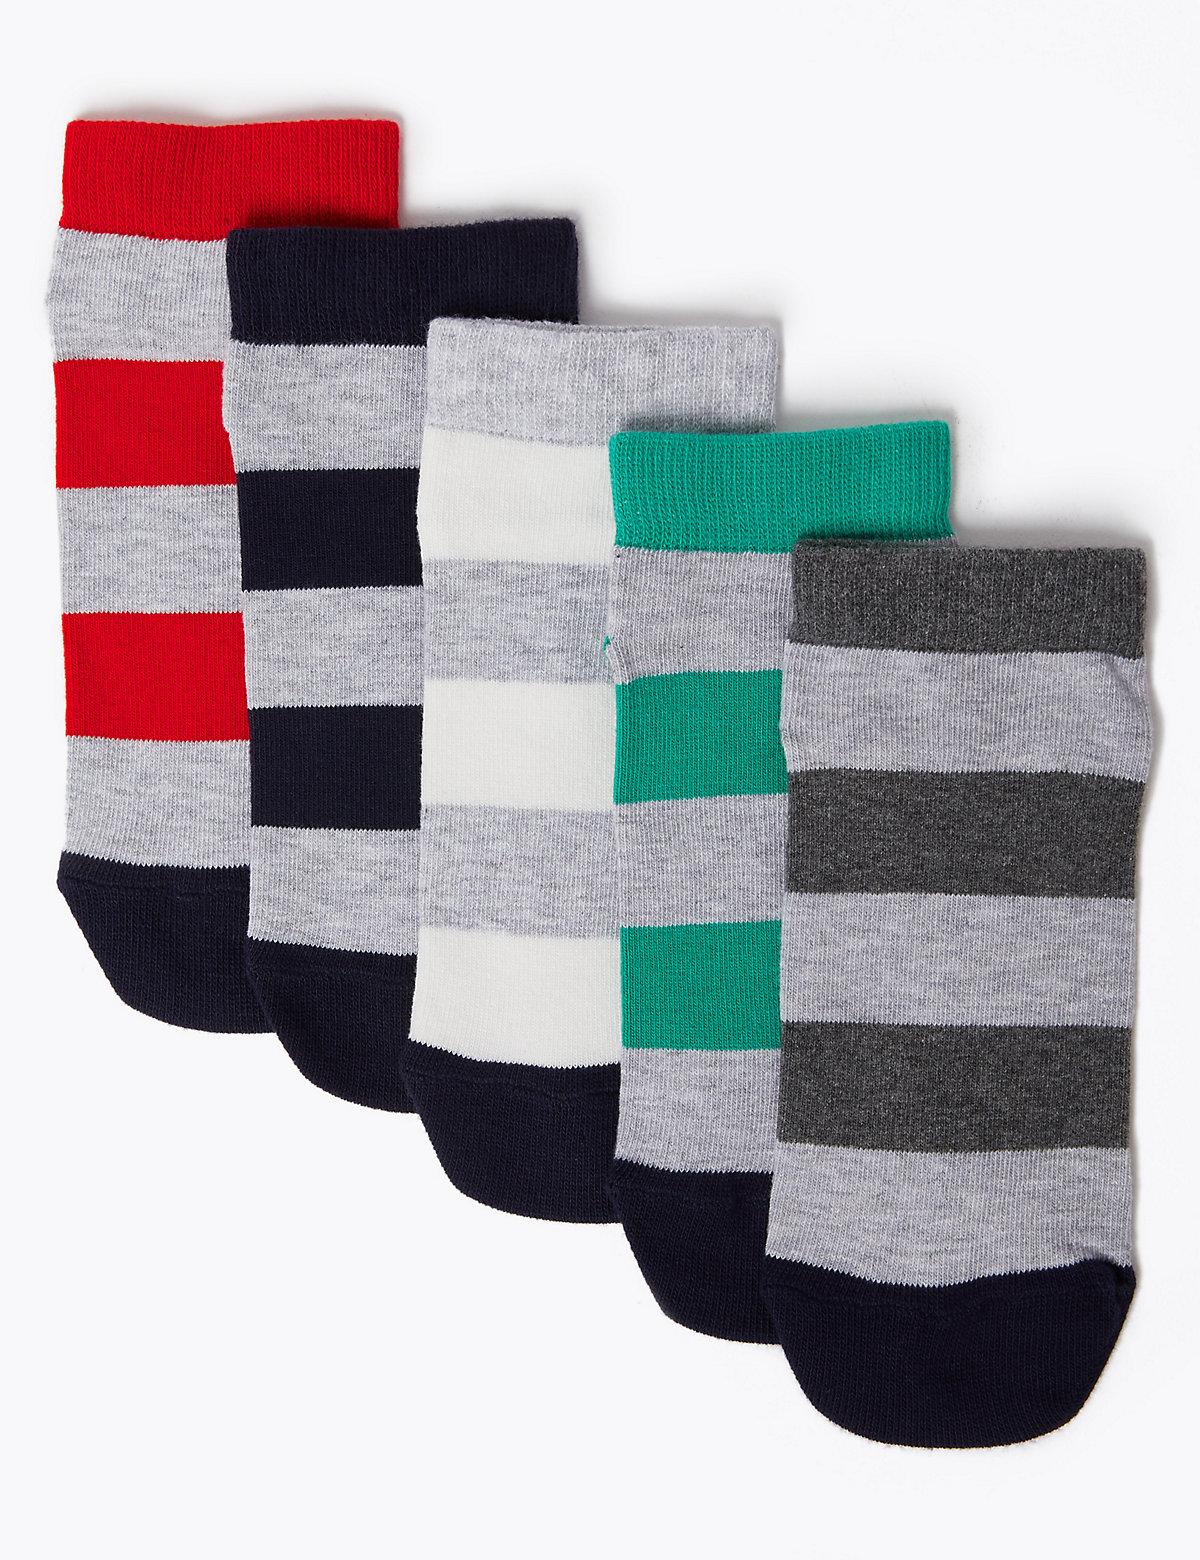 5 Pack Cotton with Lycra Trainer Liner Socks